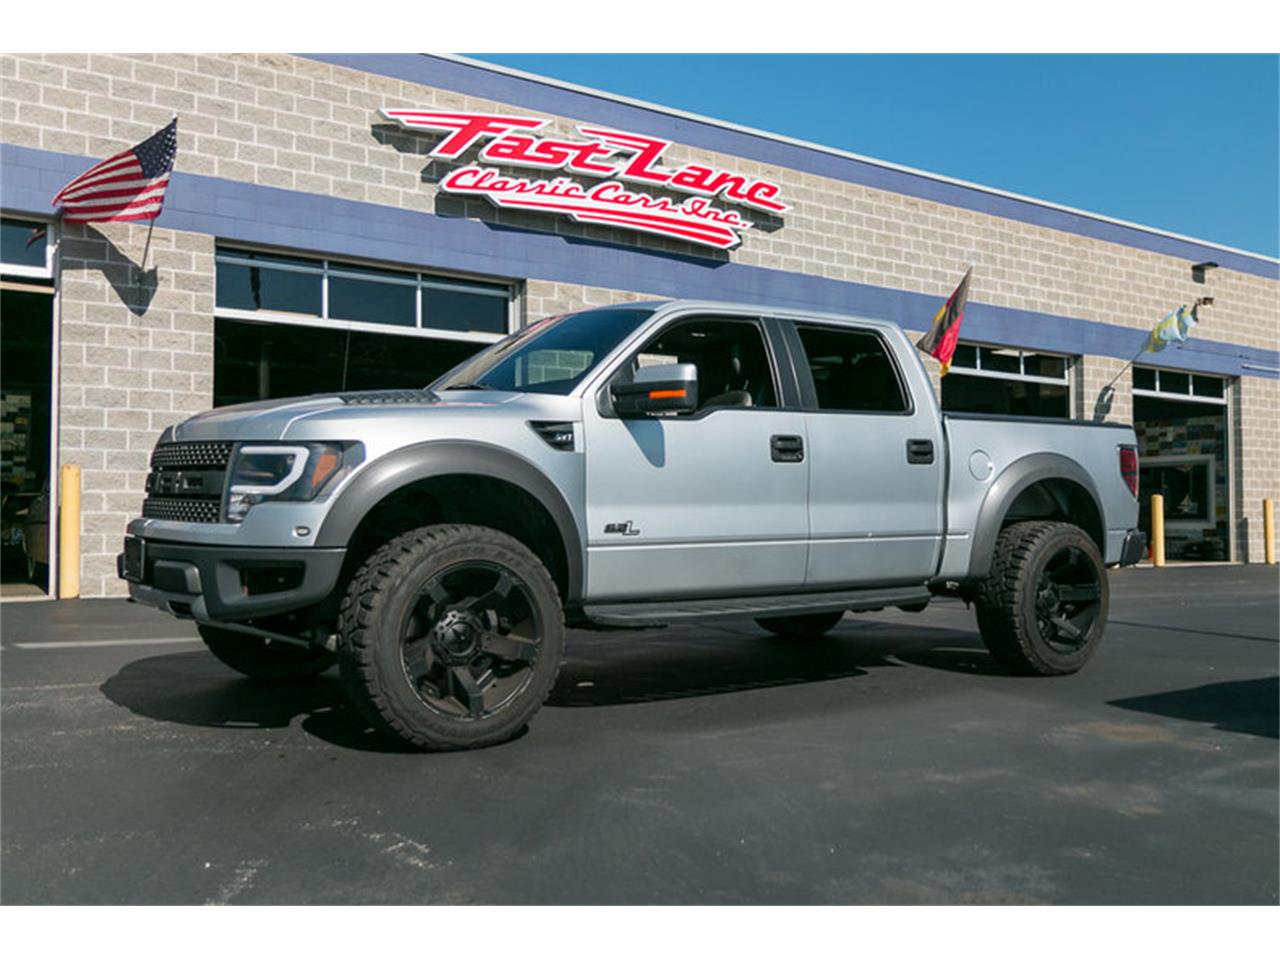 2012 Ford Raptor For Sale >> 2012 Ford Raptor For Sale Classiccars Com Cc 984784